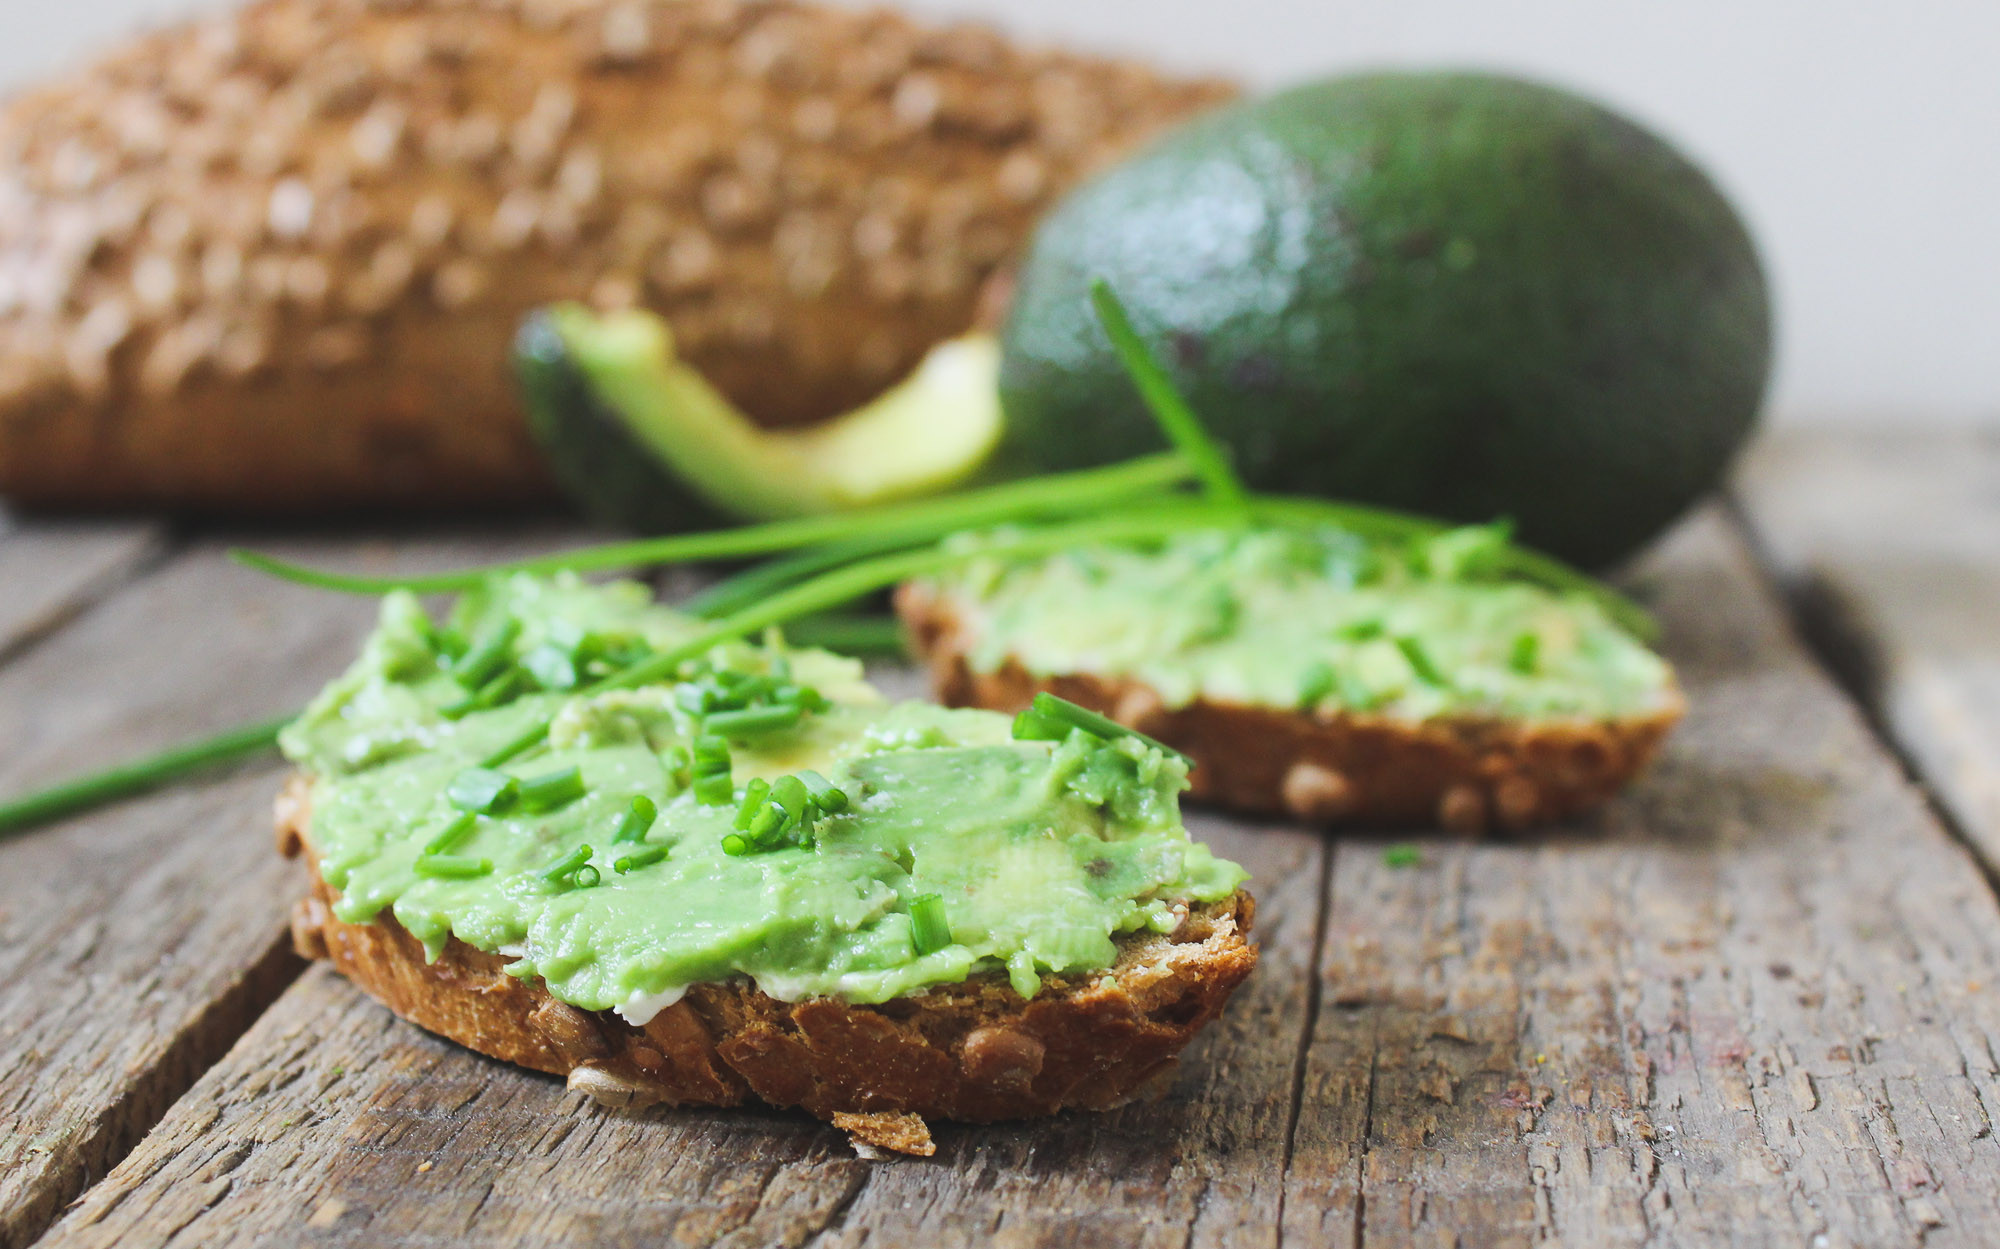 Healthy Bread Spread  Easy Avocado Lemon Spread on Wholemeal Bread BesmartEatsmart